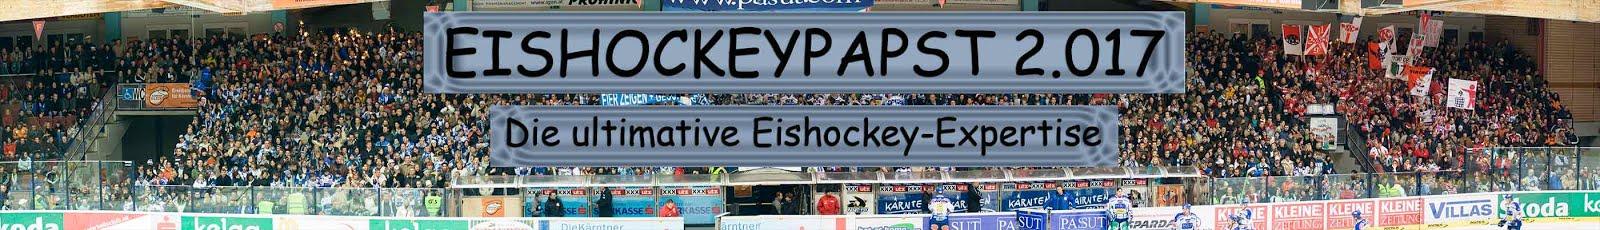 EISHOCKEYPAPST 2008 - 2017